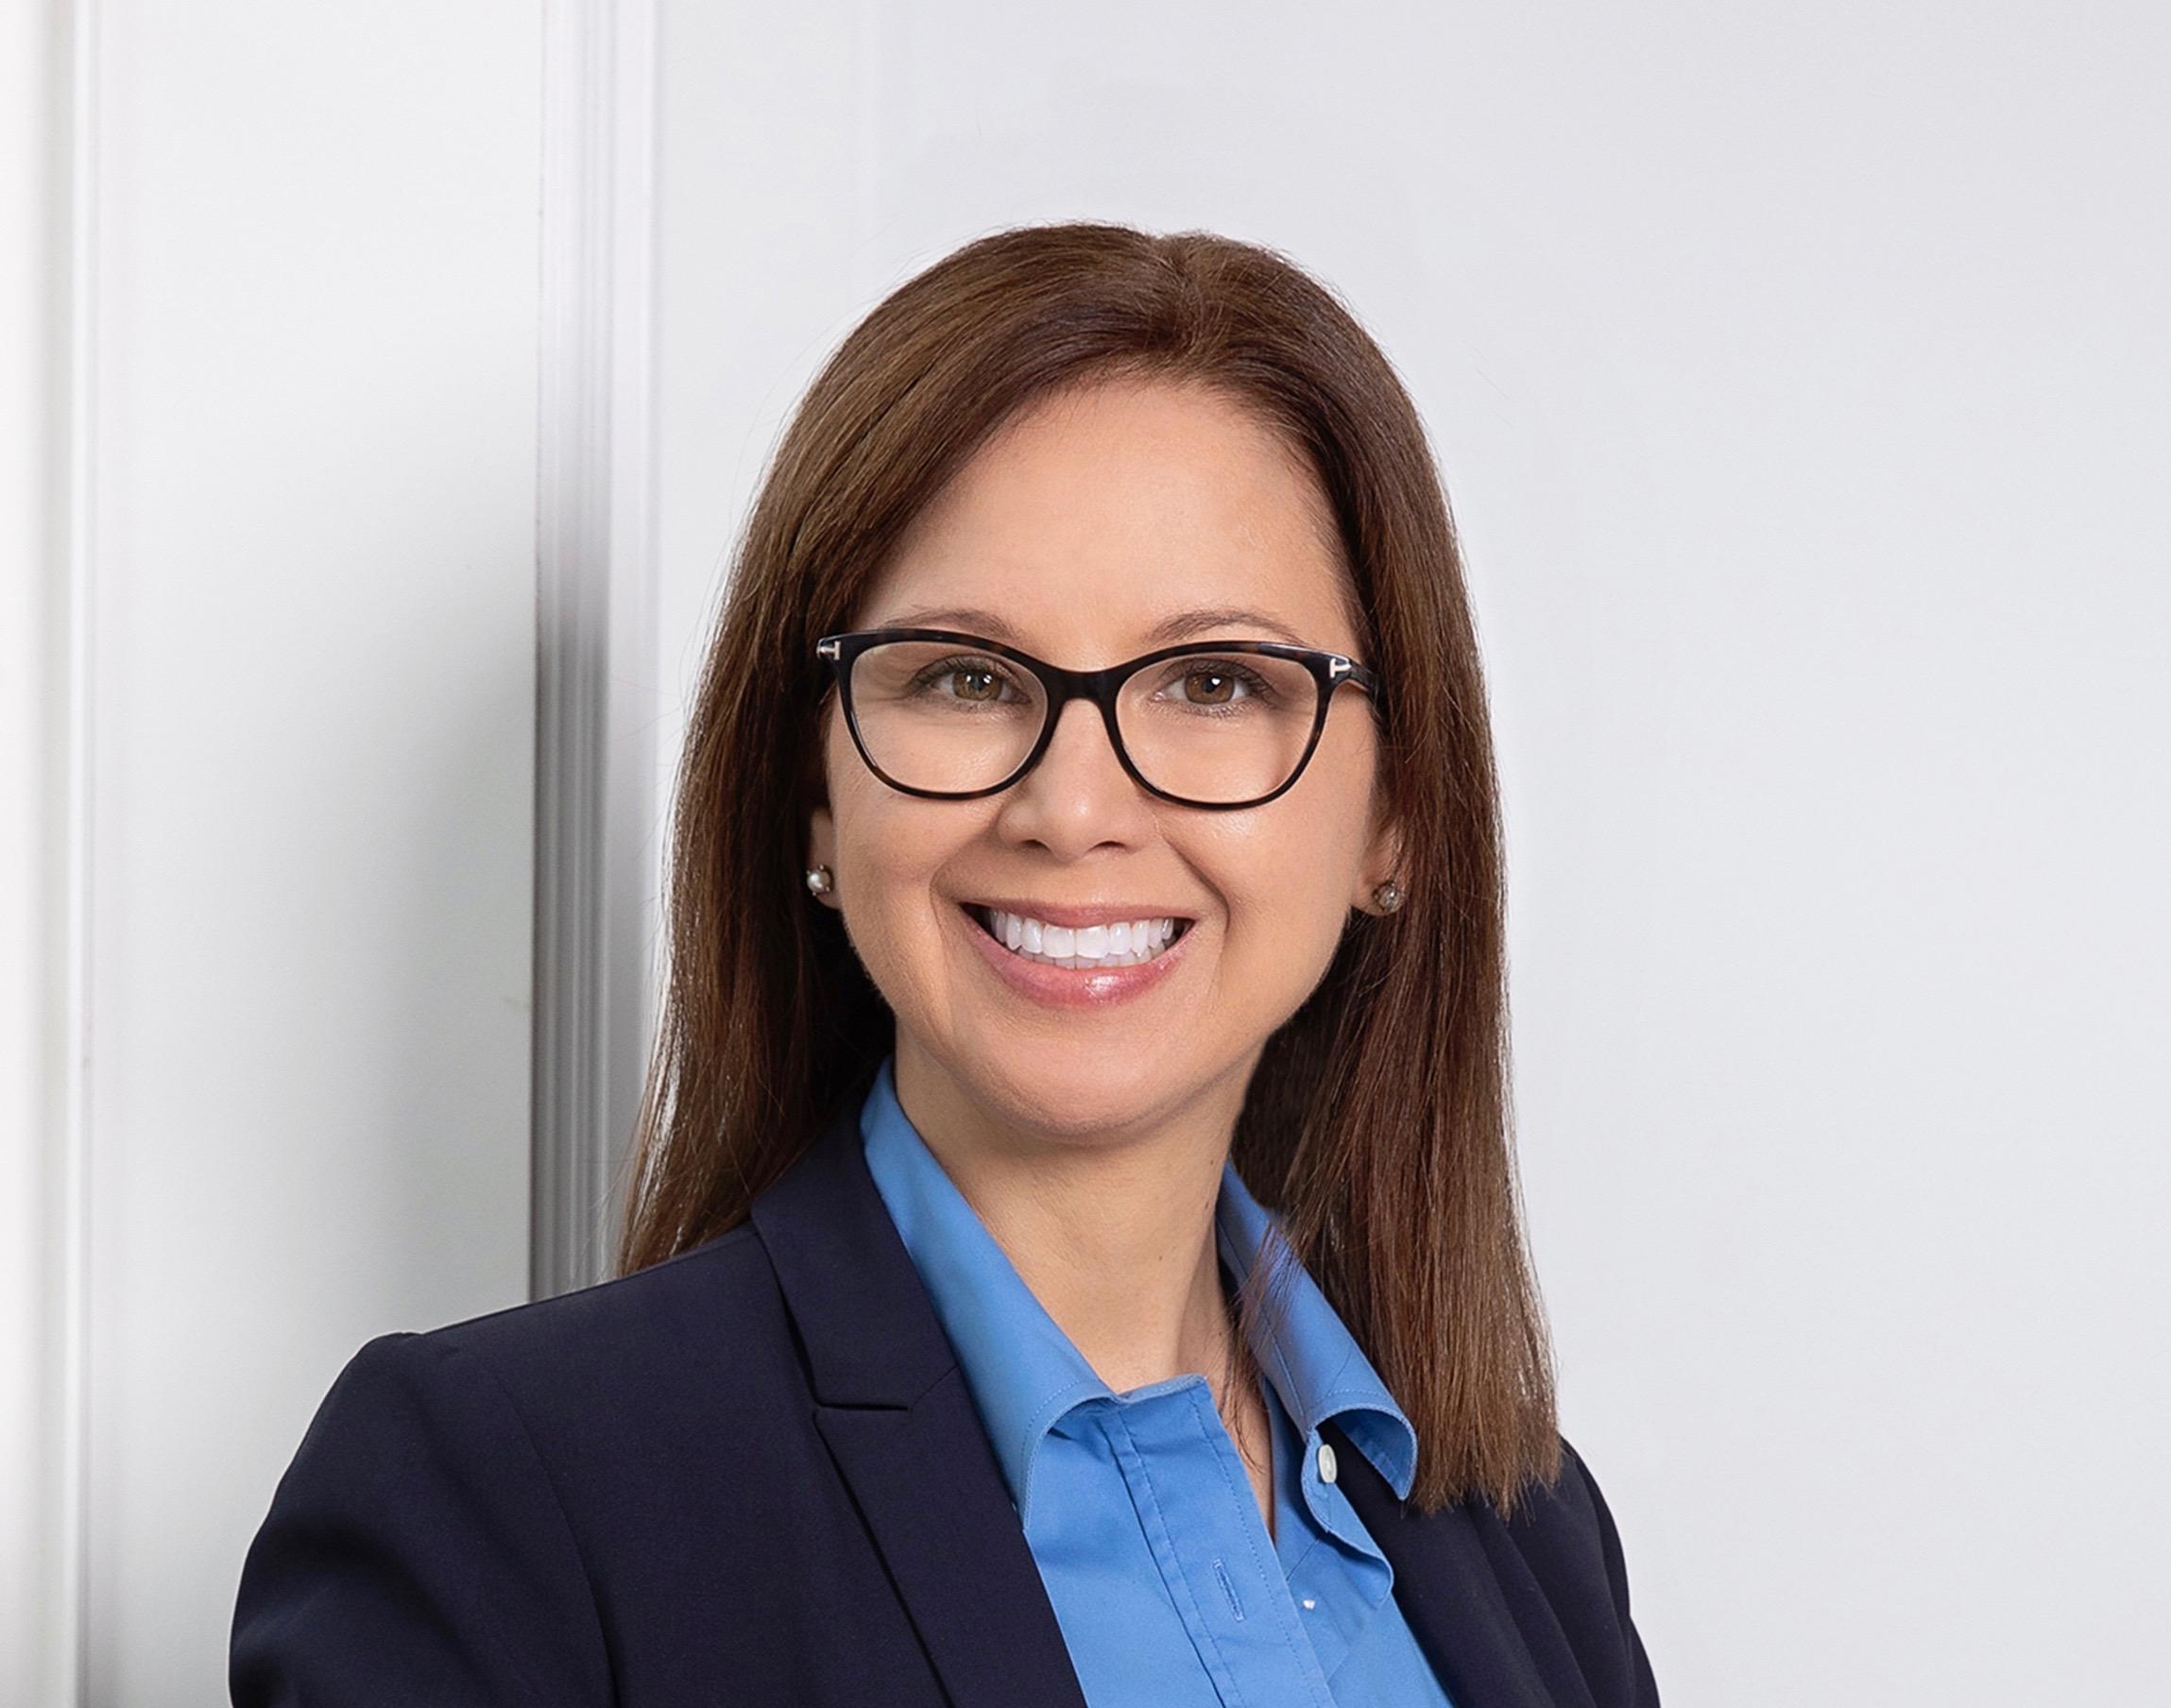 Emvitals CEO, Jenn Hunter Headshot